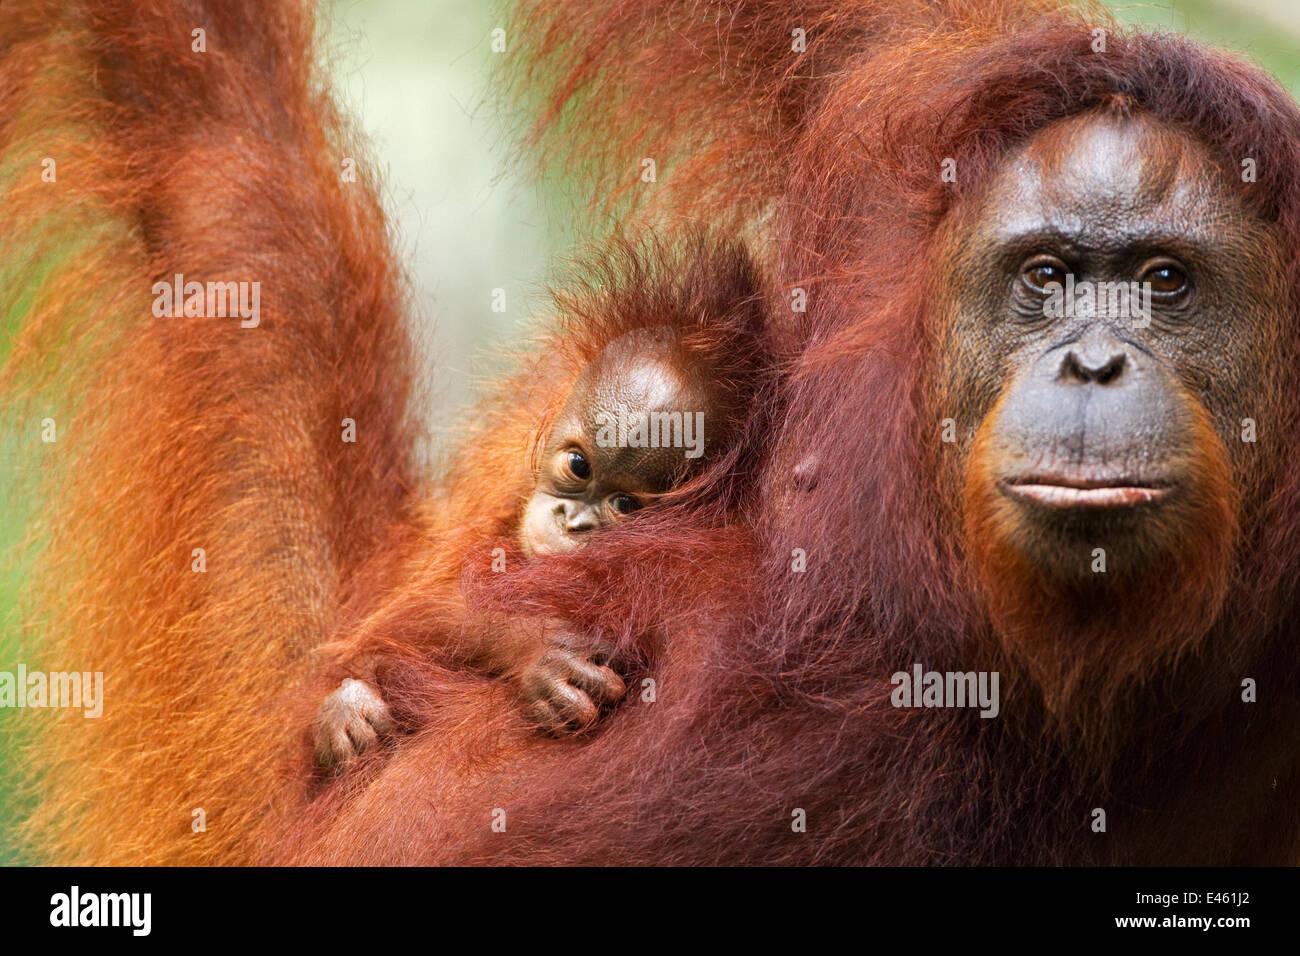 Bornean Orang-utan (Pongo pygmaeus wurmbii) female 'Tata' and her unnamed baby aged 2-3 months portrait. - Stock Image